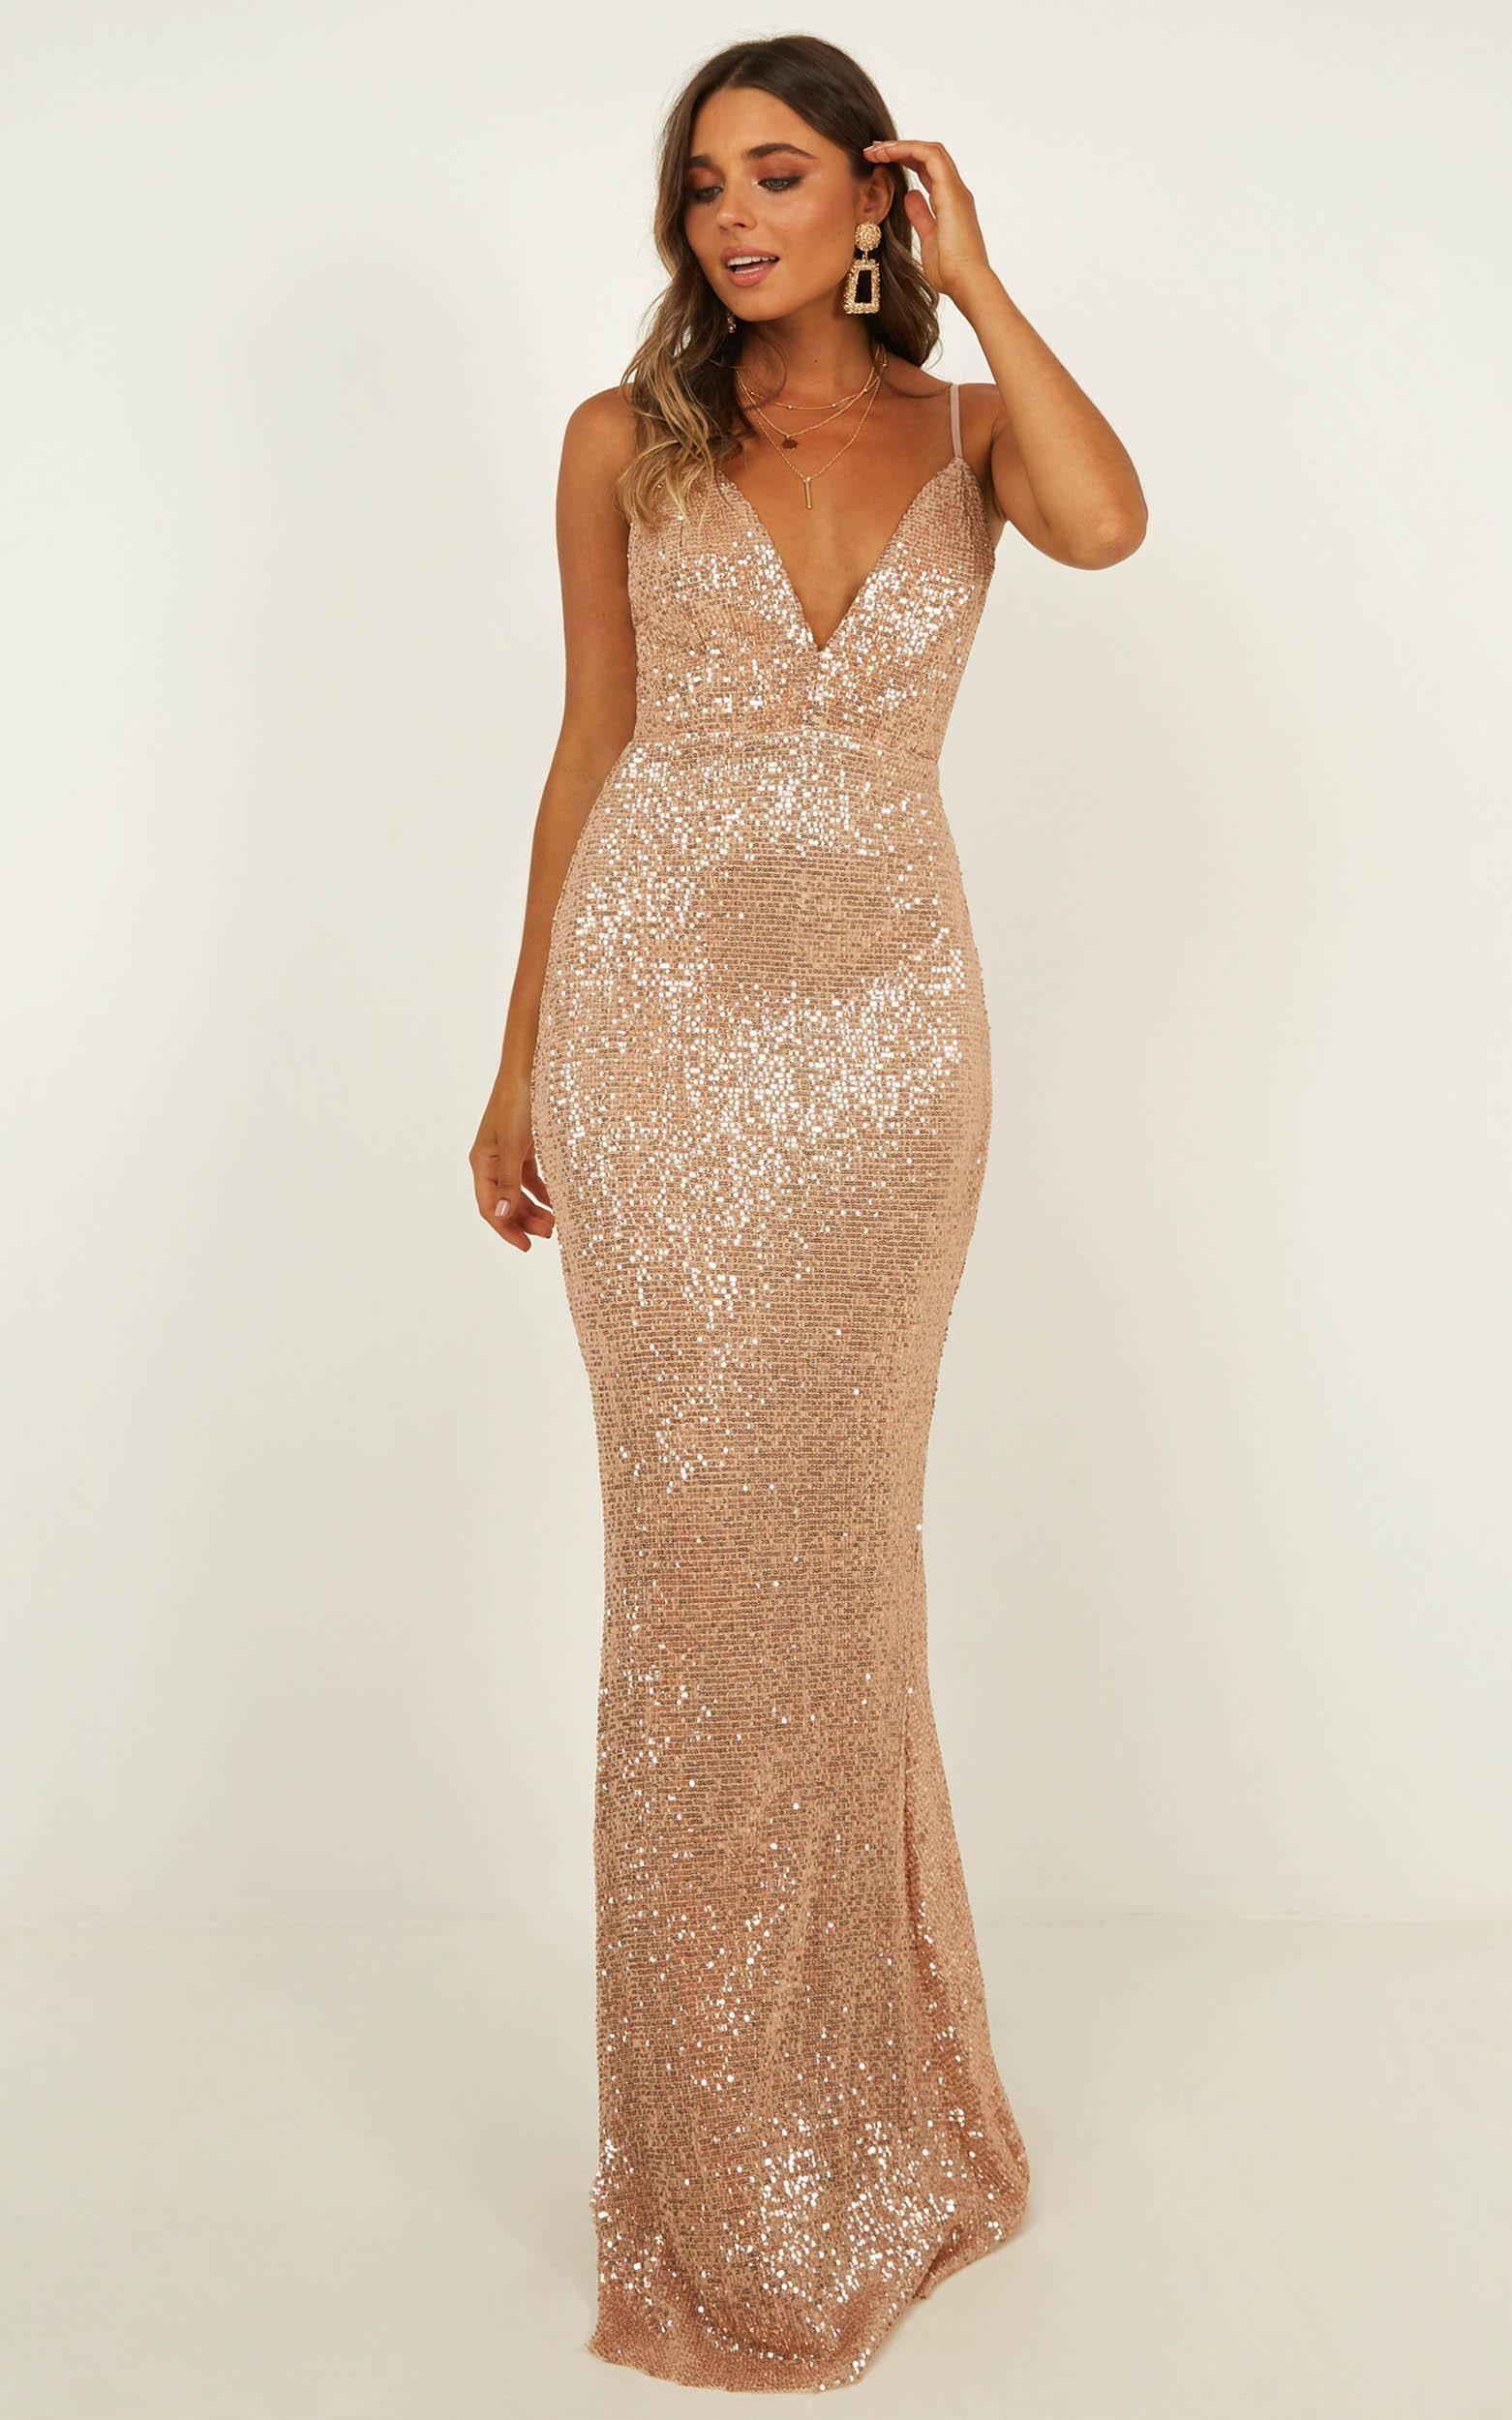 Indulge Me Maxi Dress In Rose Gold Sequin Showpo Dresses Occasion Dresses Formal Occasion Dress [ 2500 x 1562 Pixel ]